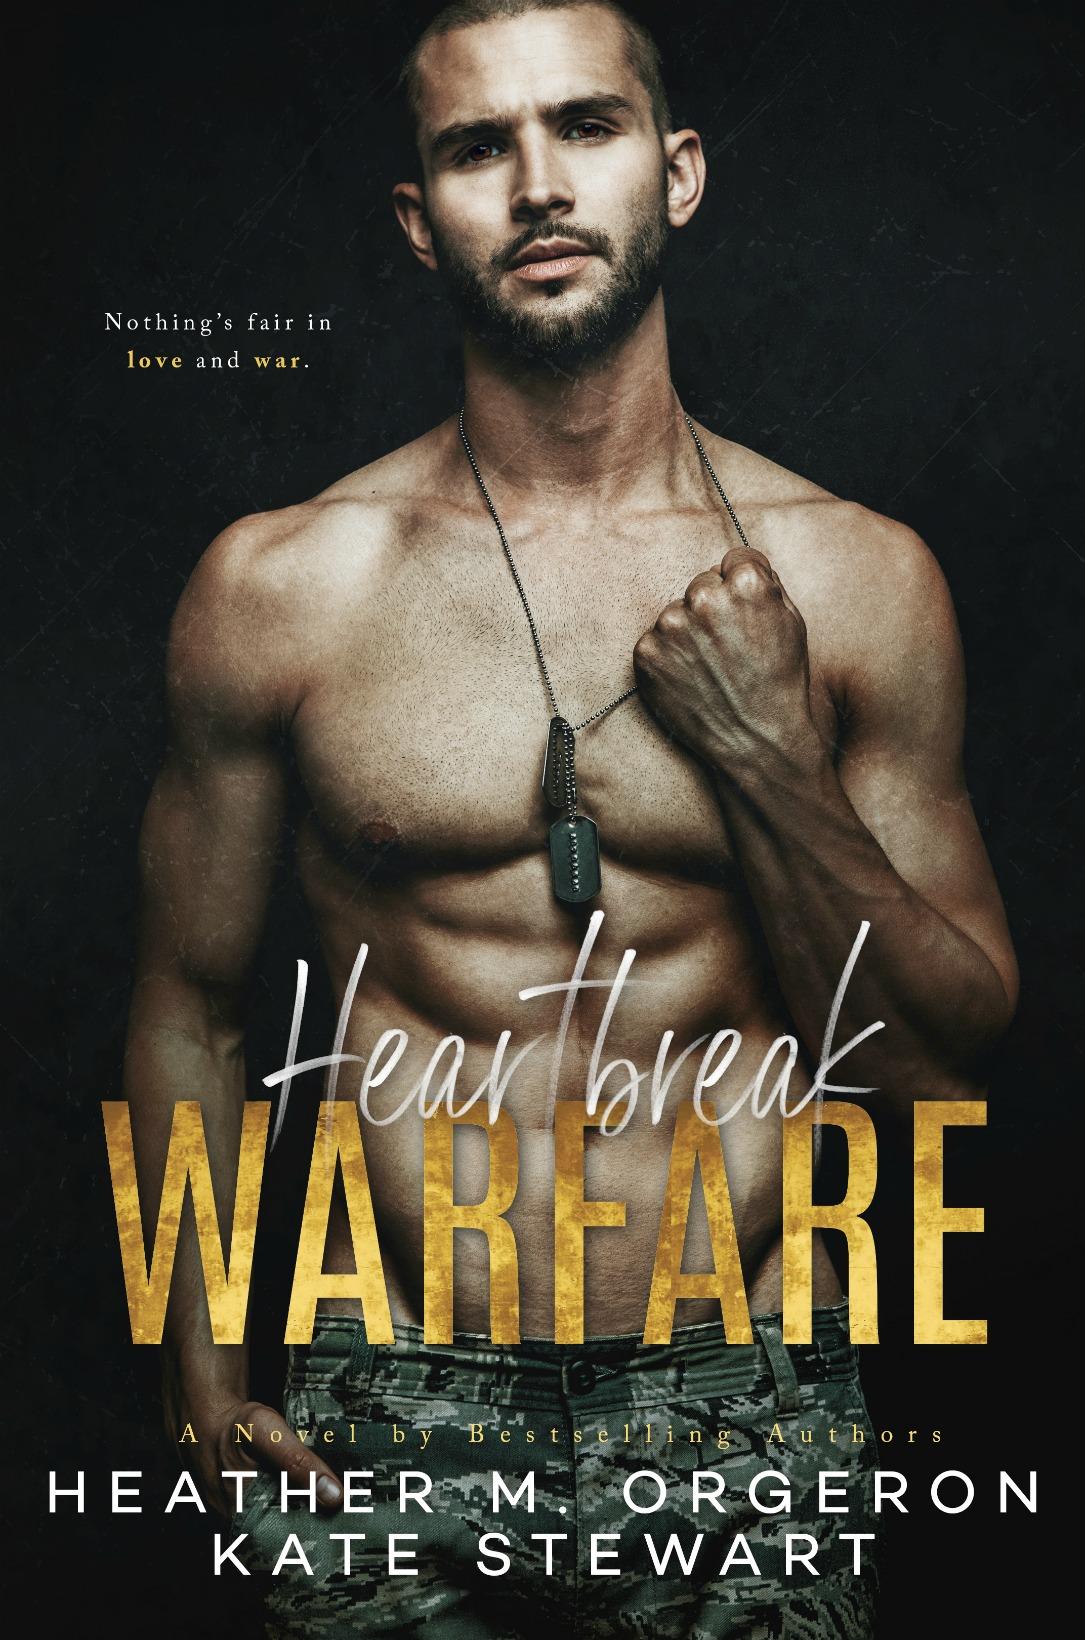 Heartbreak Warfare by Kate Stewart and Heather M. Orgeron [Review]